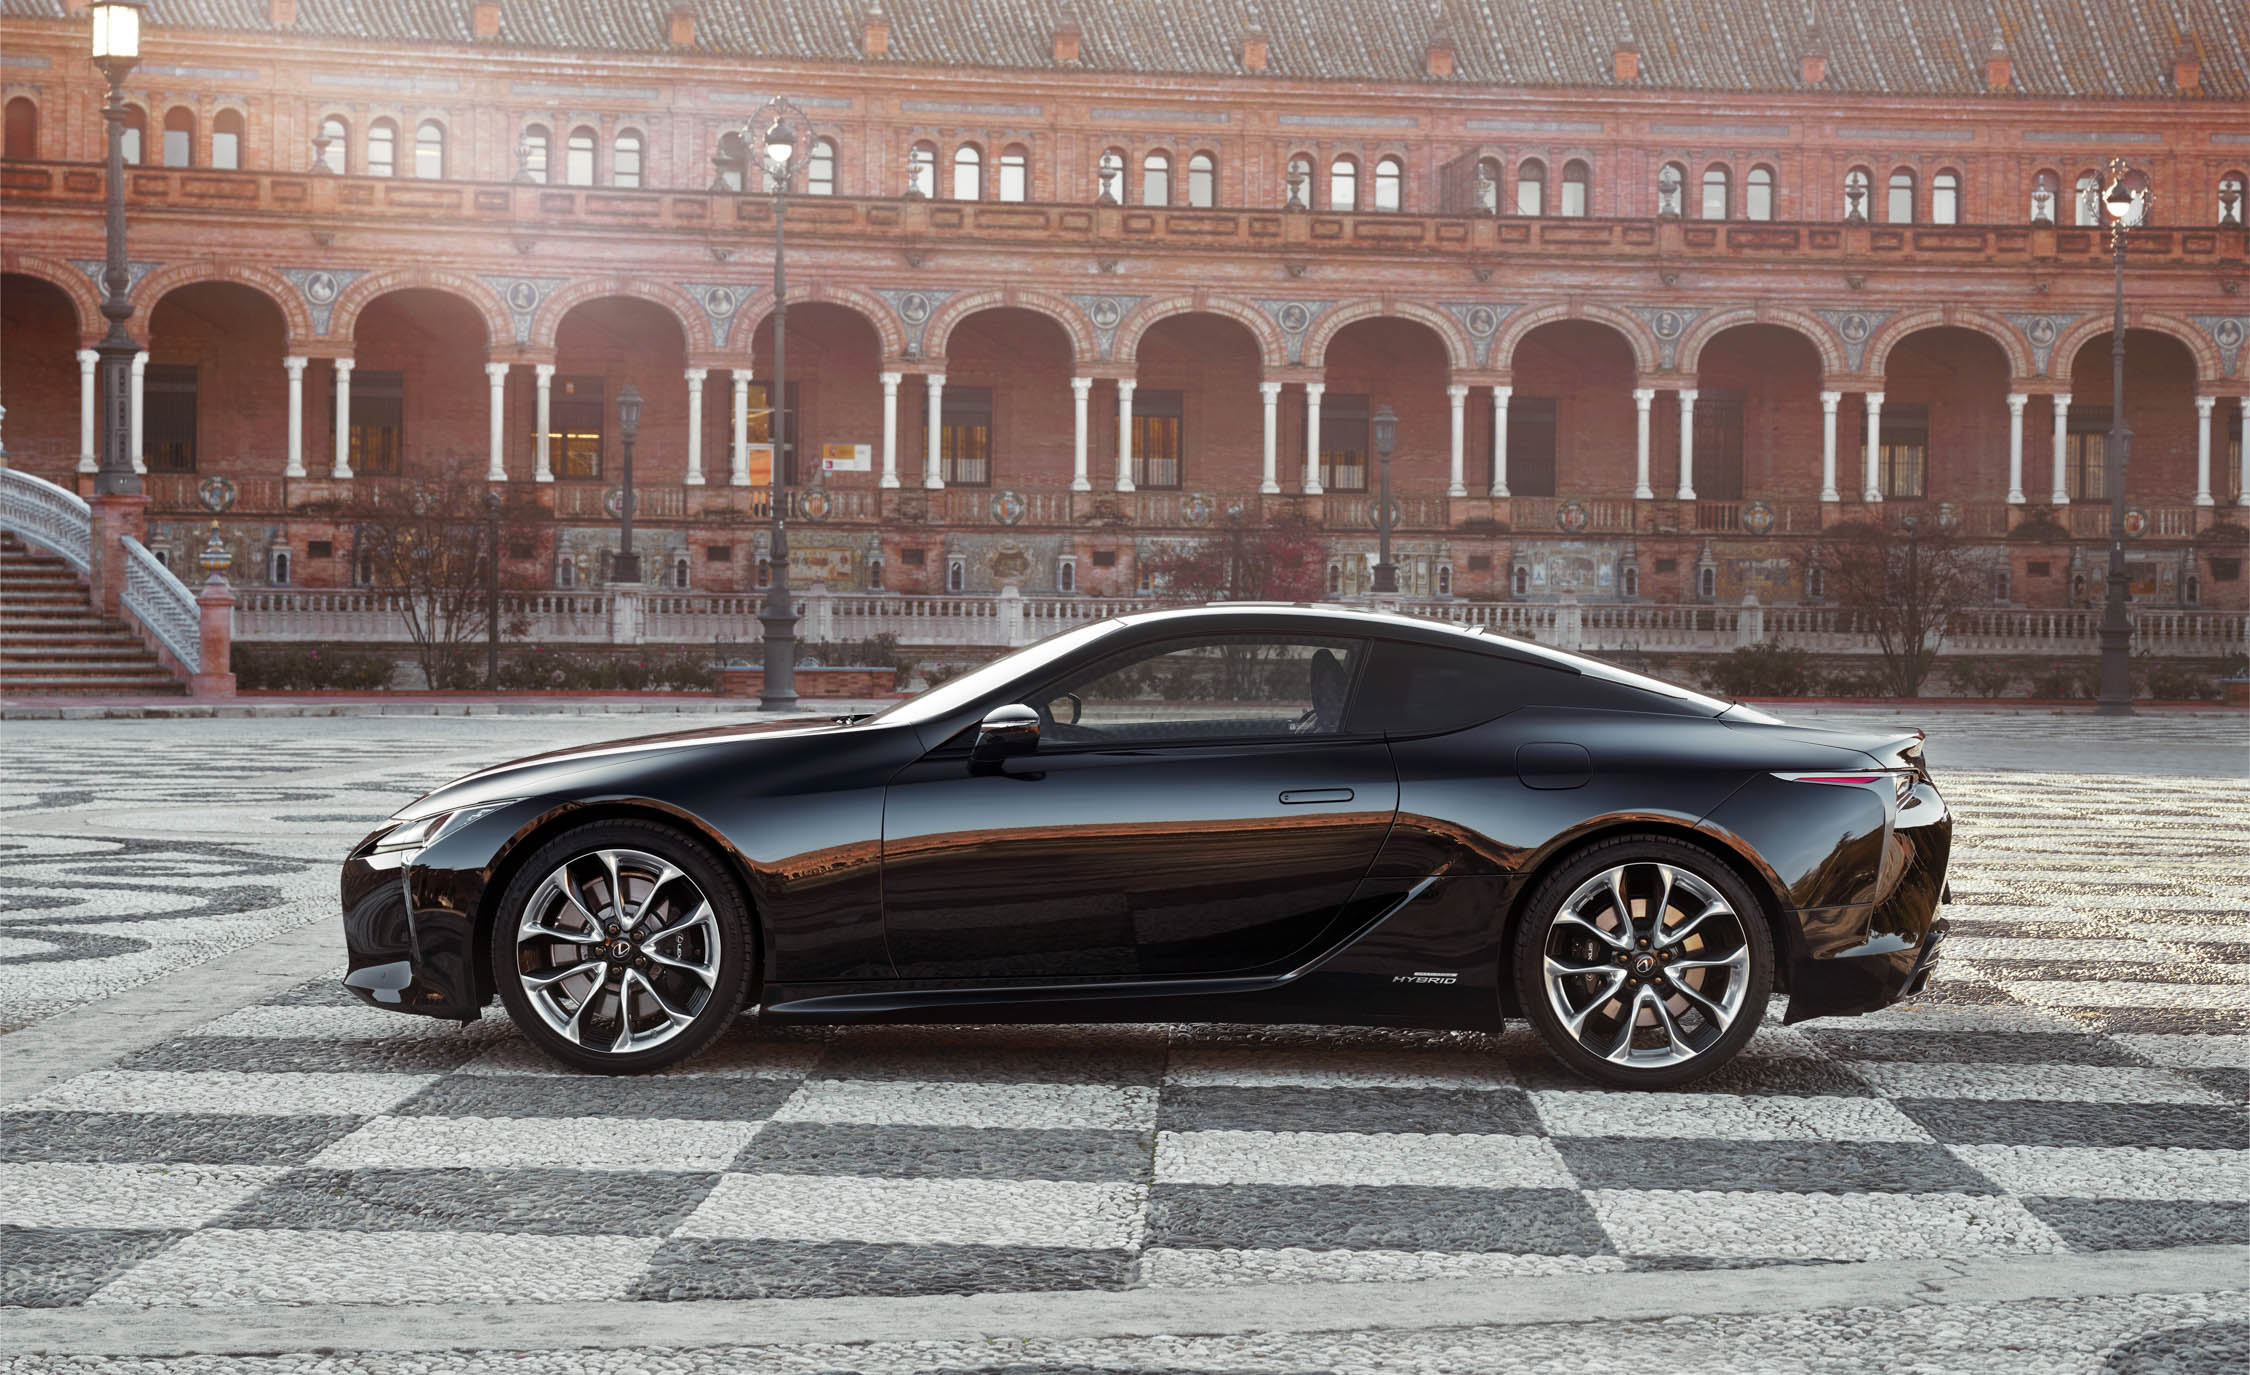 2018 Lexus Lc 500h Black Exterior Side (Photo 45 of 84)